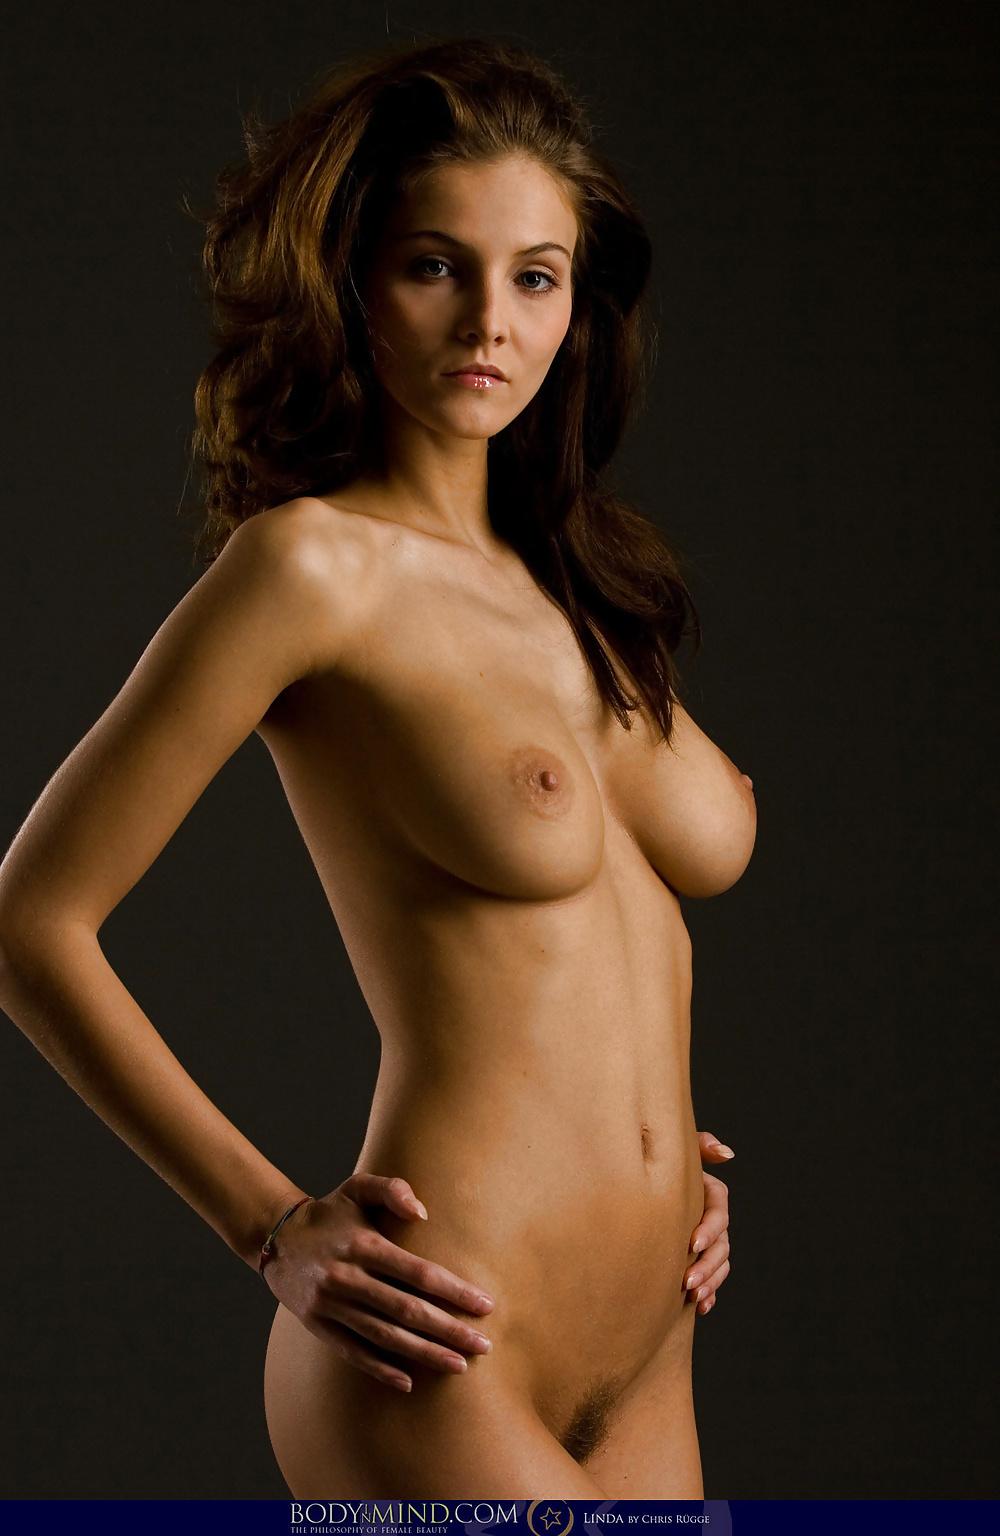 Milena Govich Nude Pussy